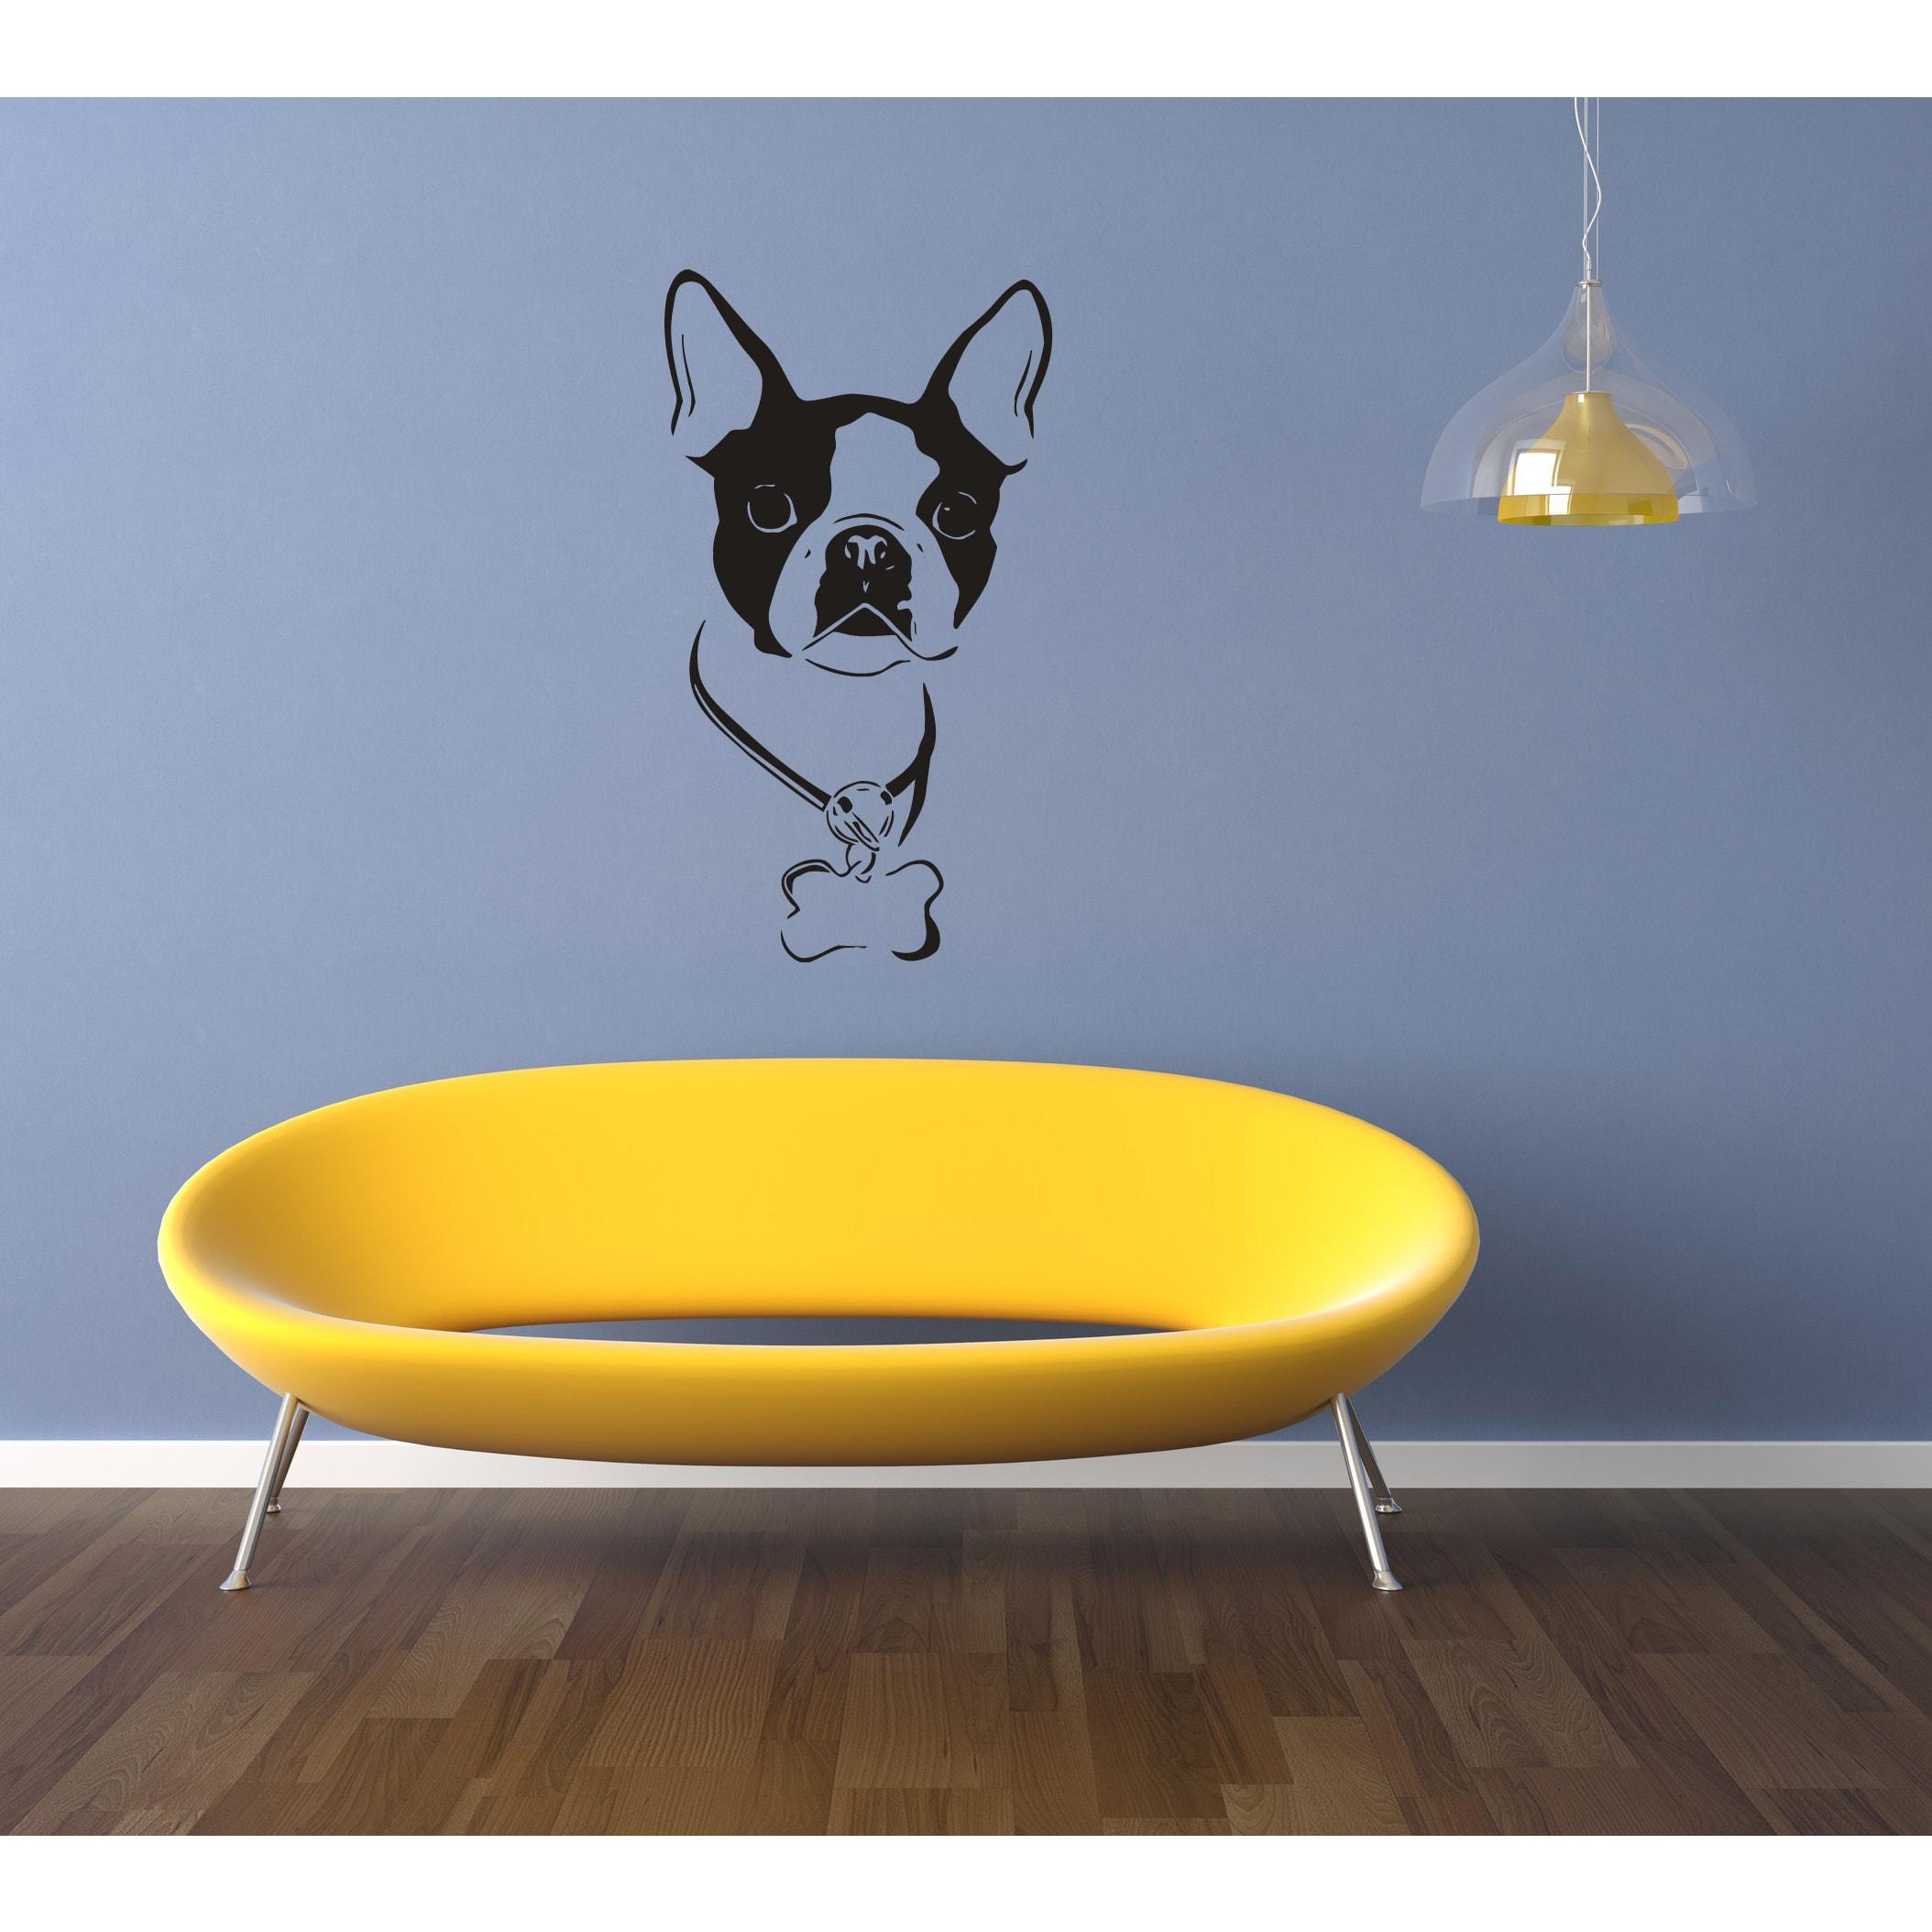 Boston Terrier Dog Drupel Wall Art Sticker Decal - Free Shipping On ...